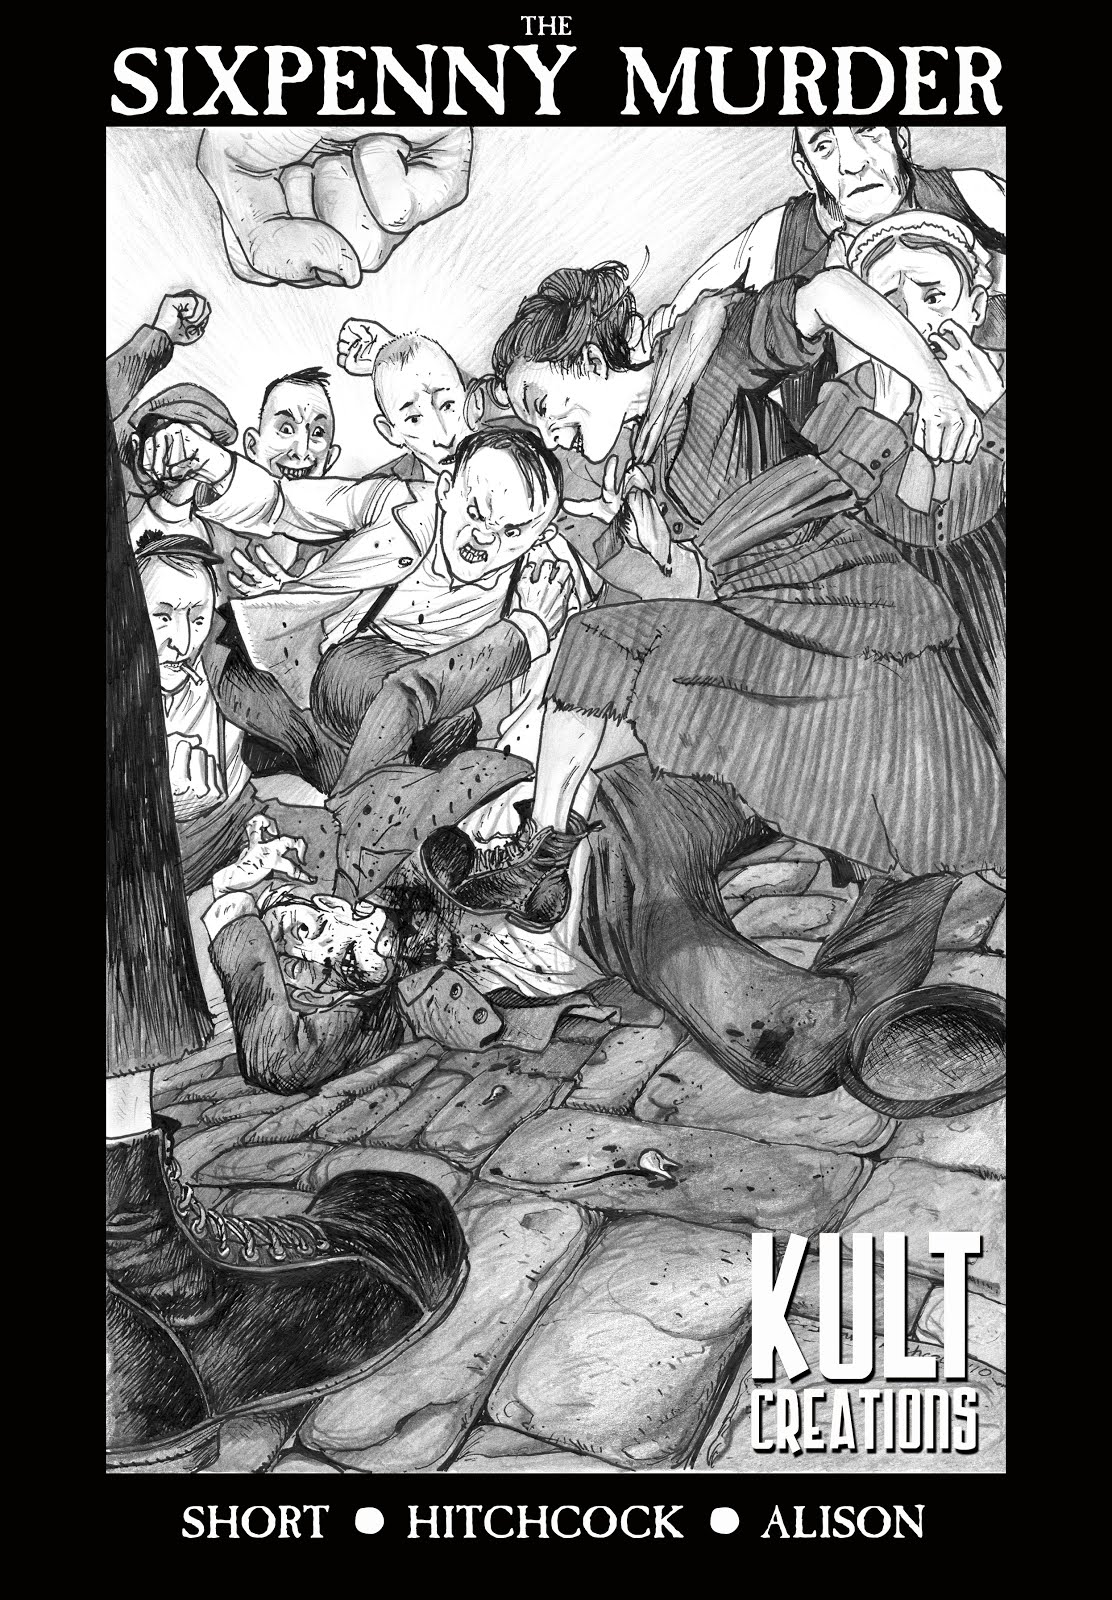 Buy 'The Sixpenny Murder' digital comic